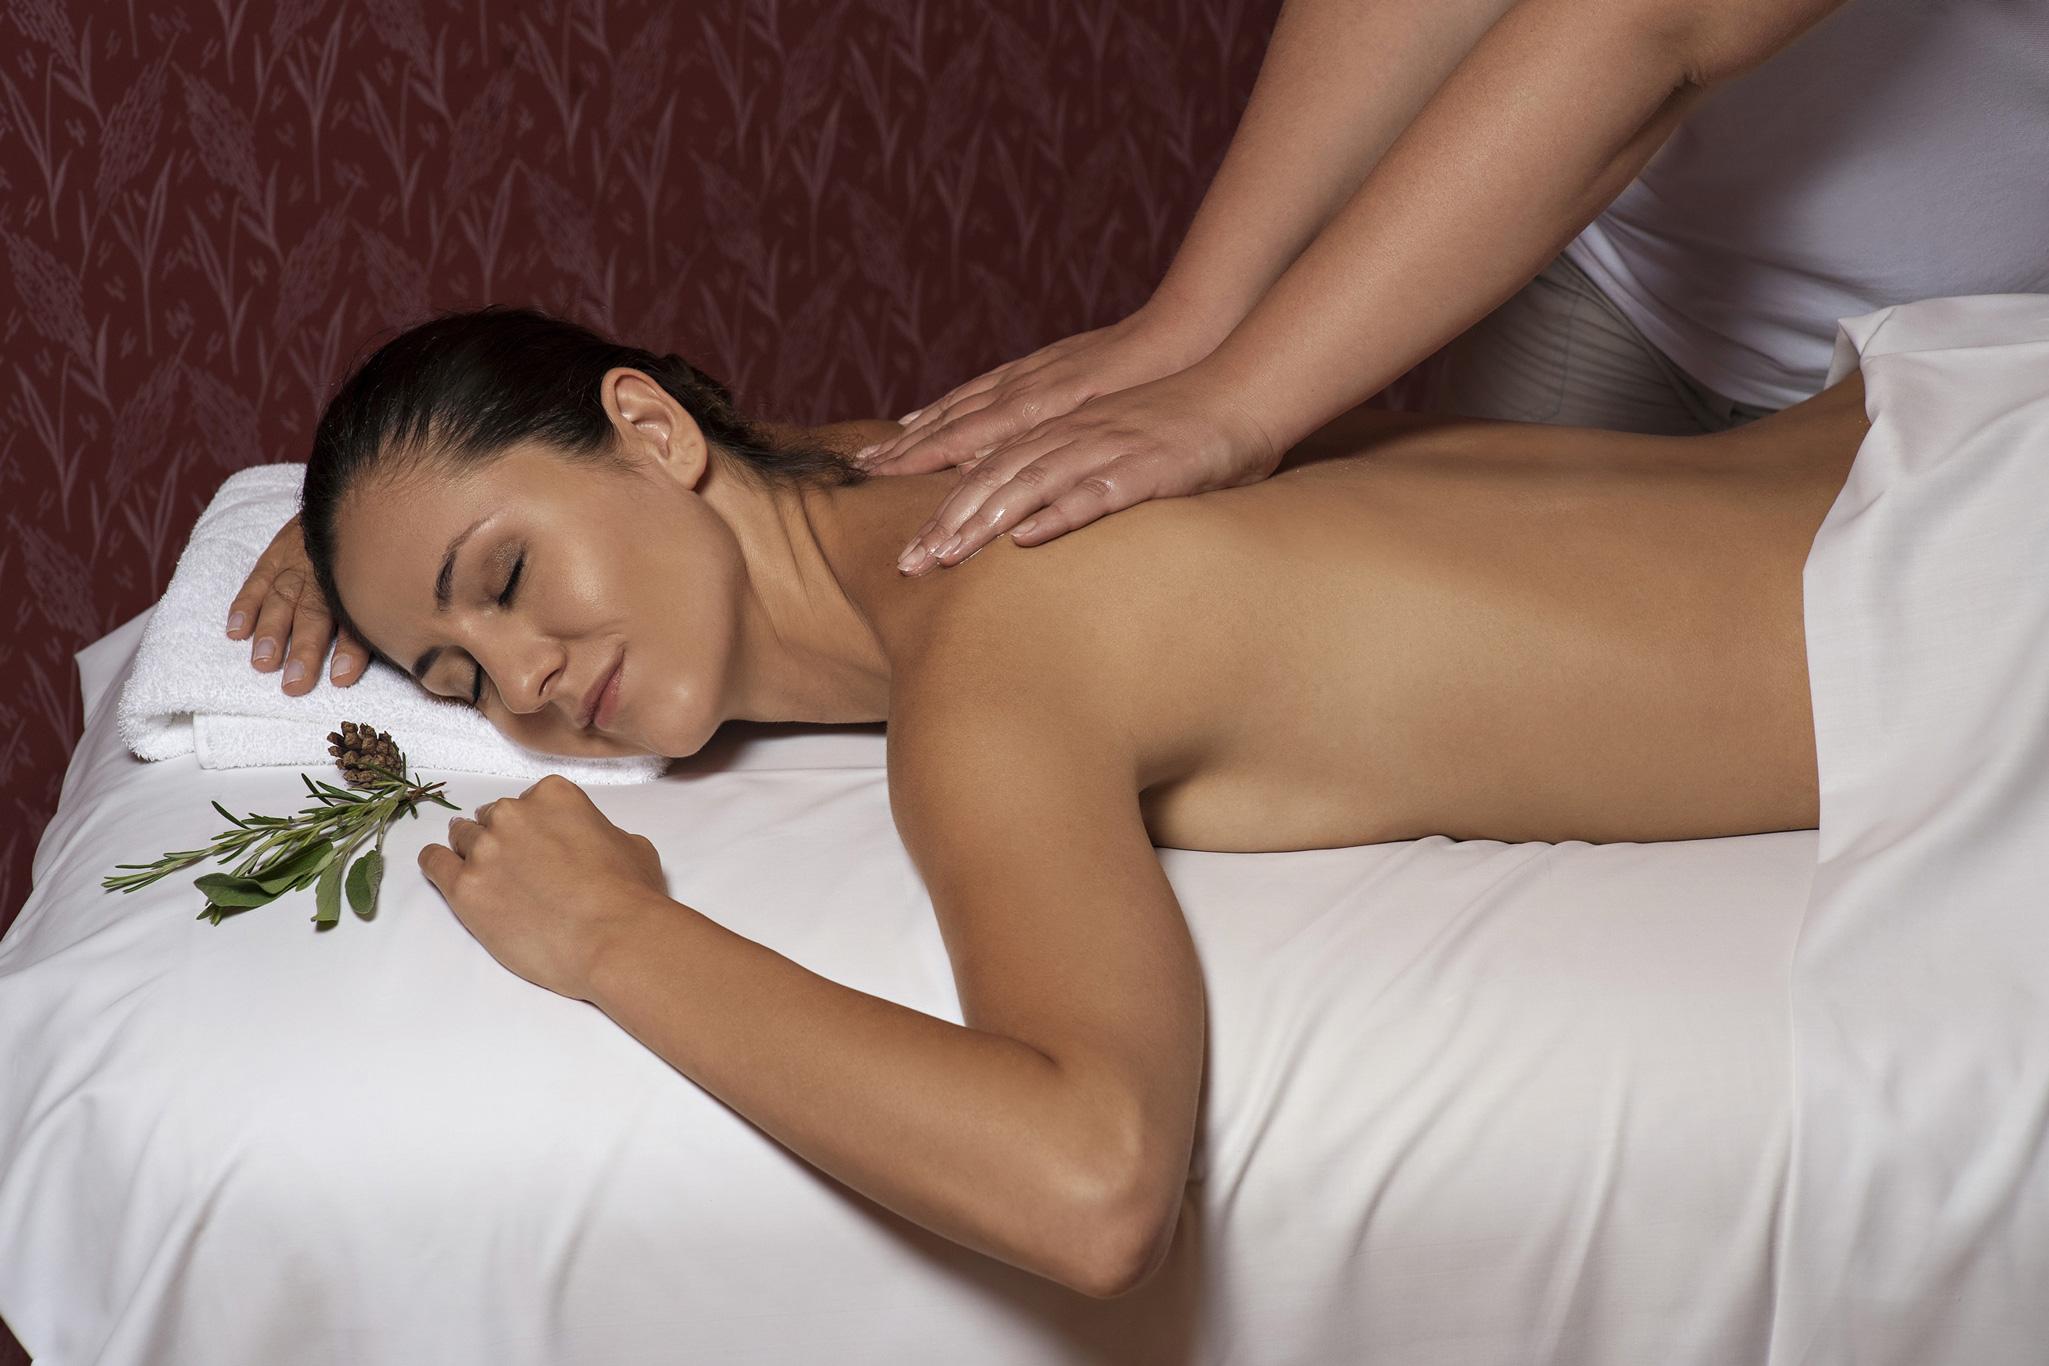 Women-have-massage_02_ZWC_RikliBalanceHotel_Foto-DD_07-15_low-res